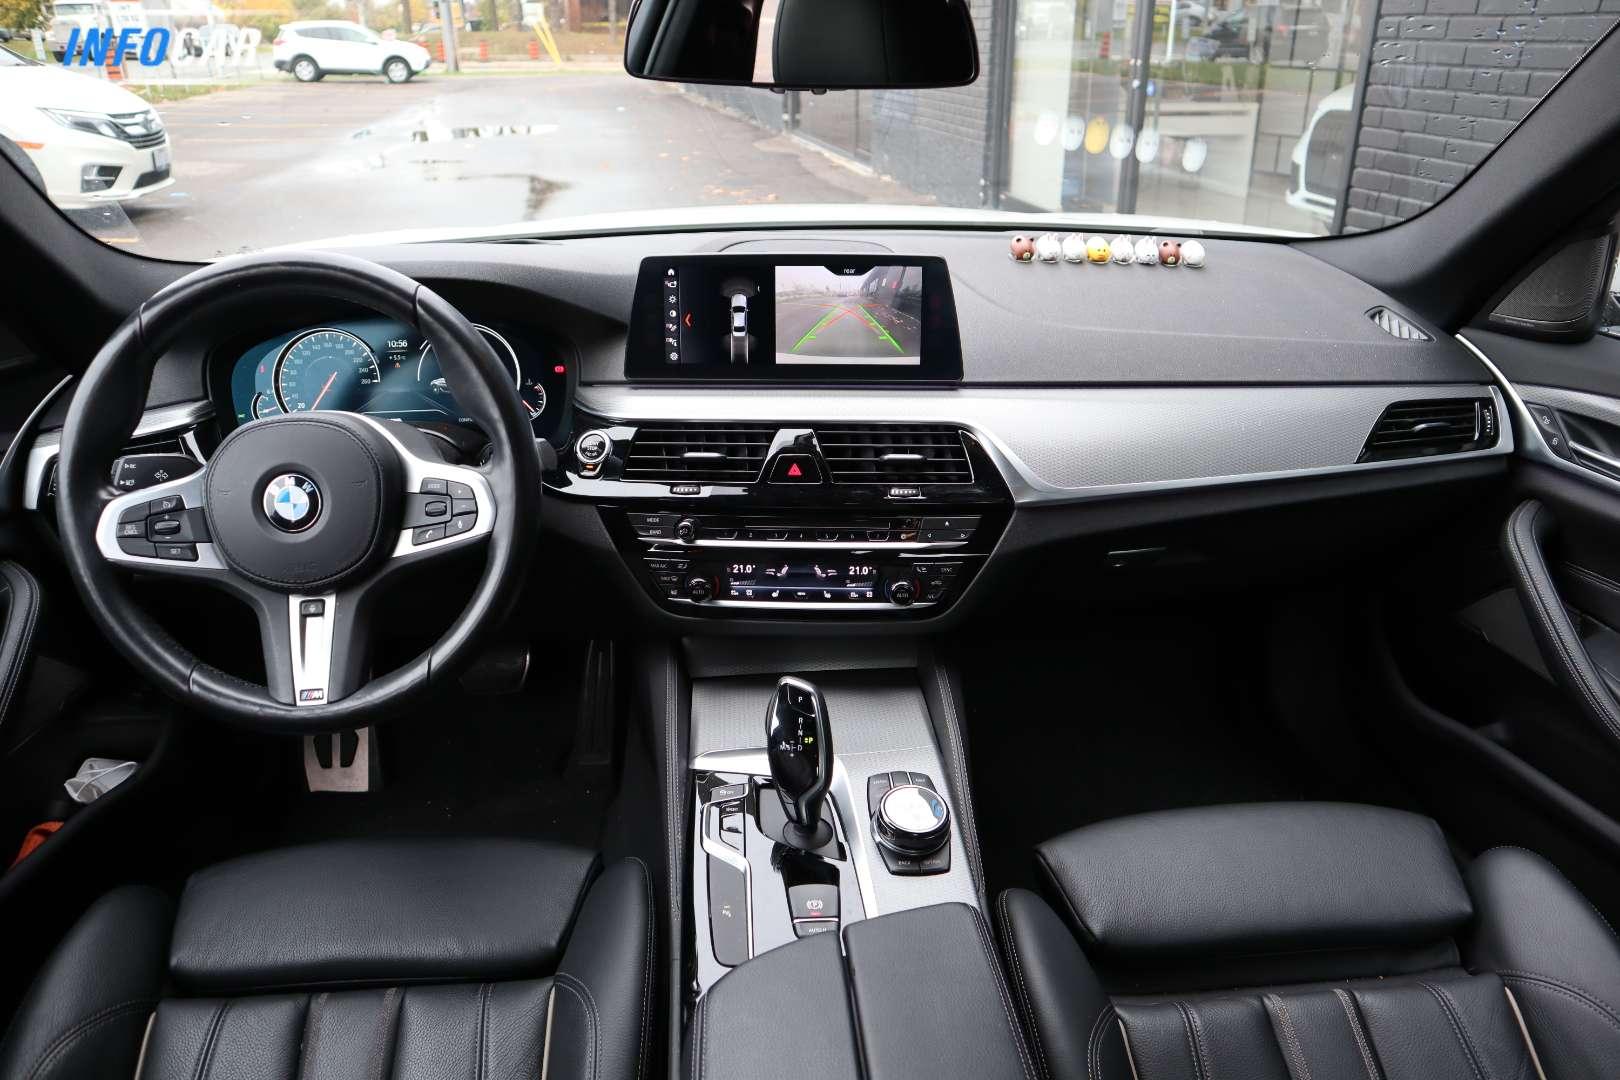 2017 BMW 5-Series 530i xDrive - INFOCAR - Toronto's Most Comprehensive New and Used Auto Trading Platform